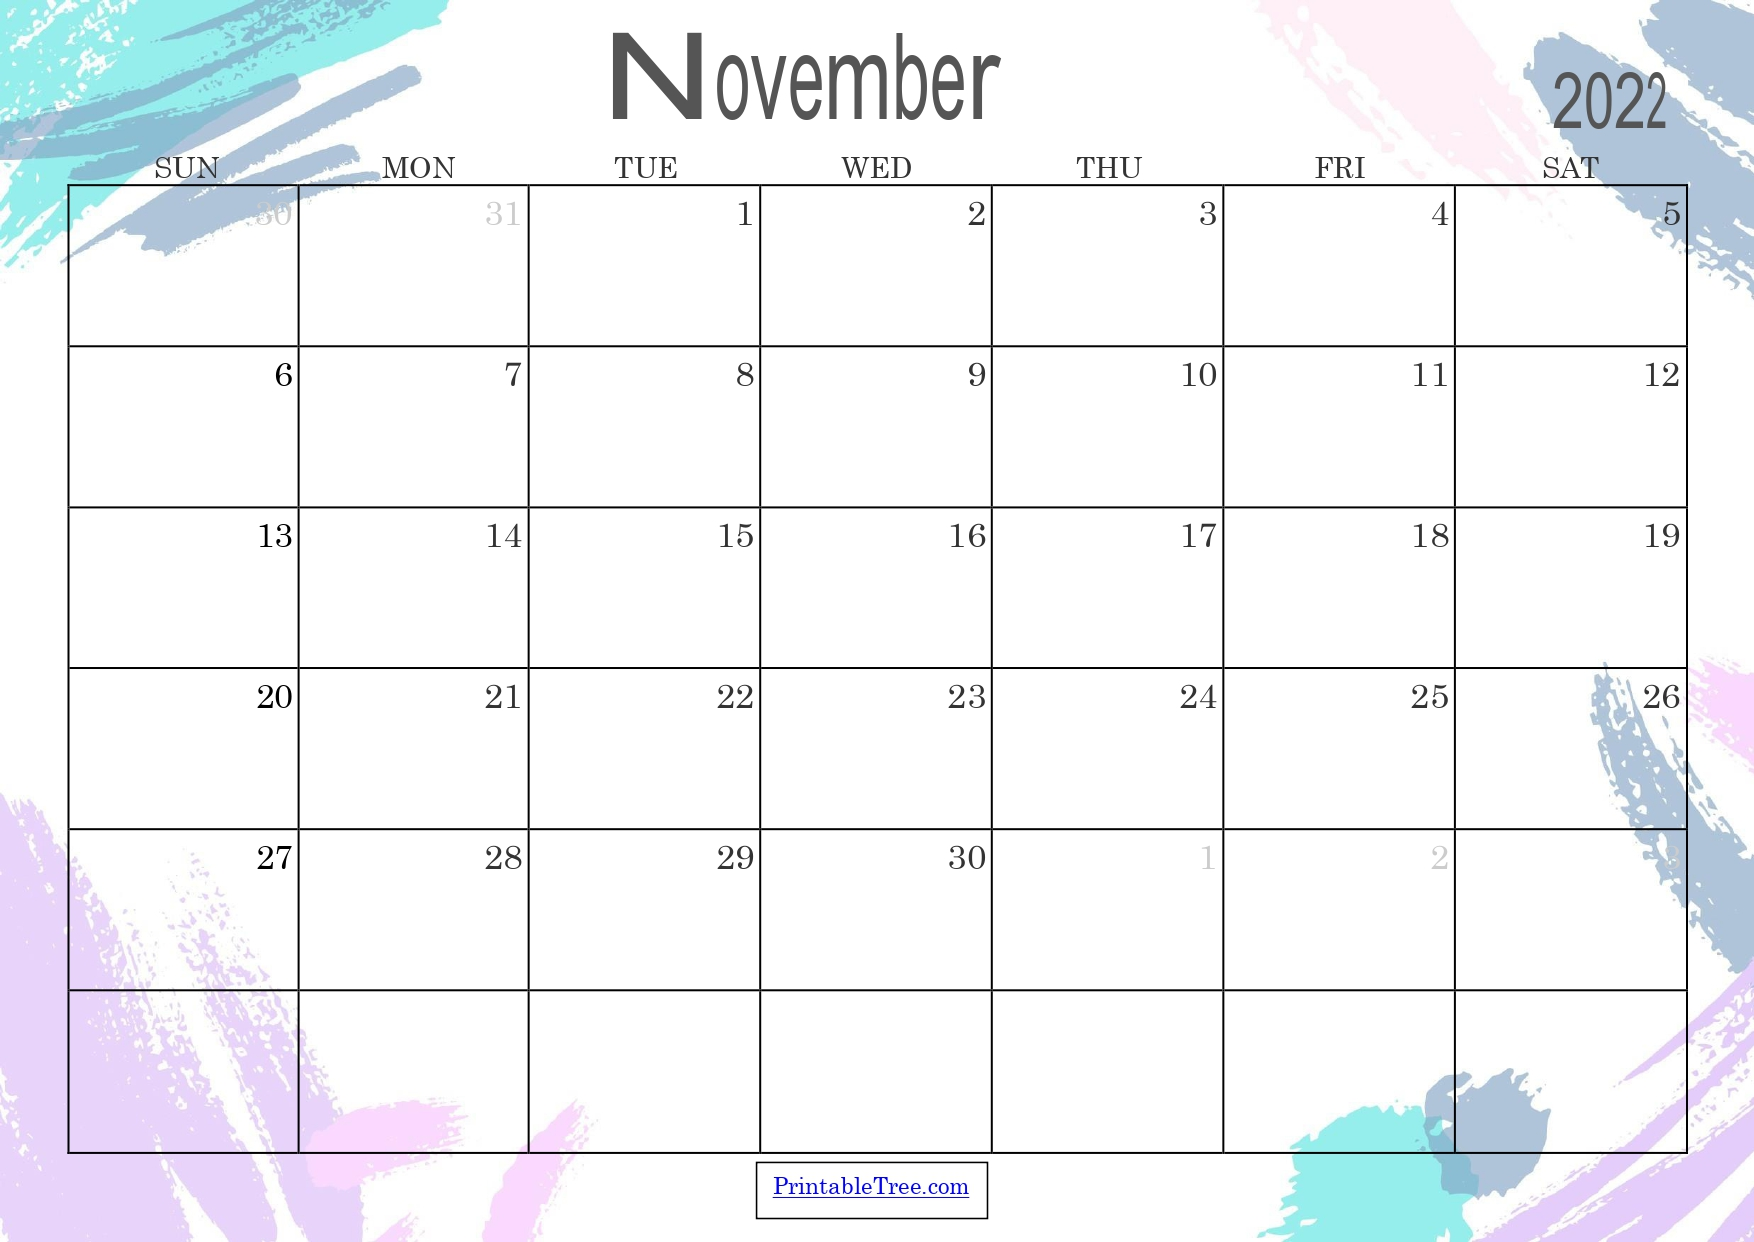 Colored Monthly Calendar November 2022